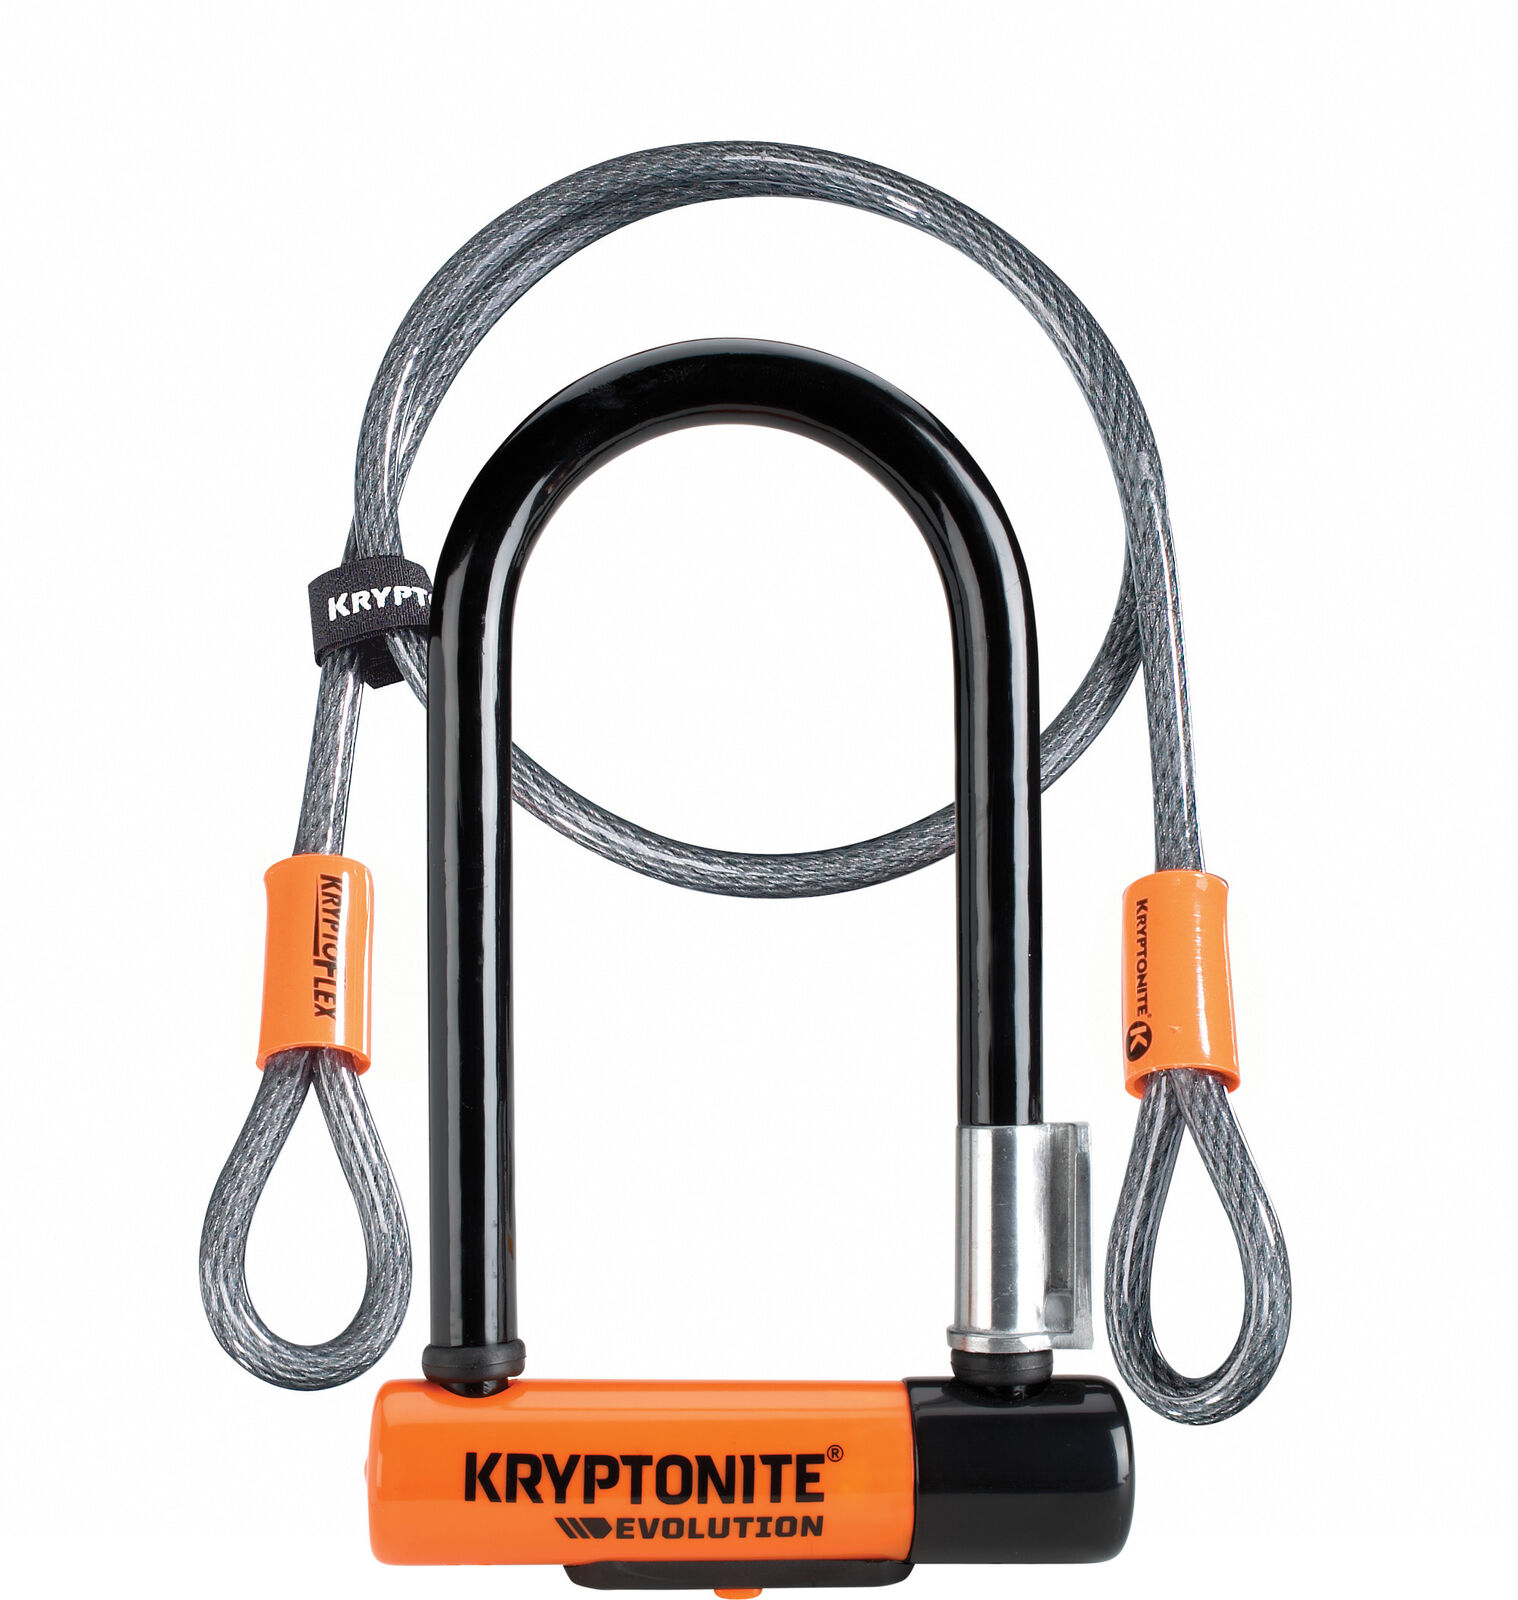 Kryptonite Evolution Evolution Kryptonite Mini 7 Schloss mit 4 Fuß Kryptoflex Kabel mit Flexframe BH cba7f5